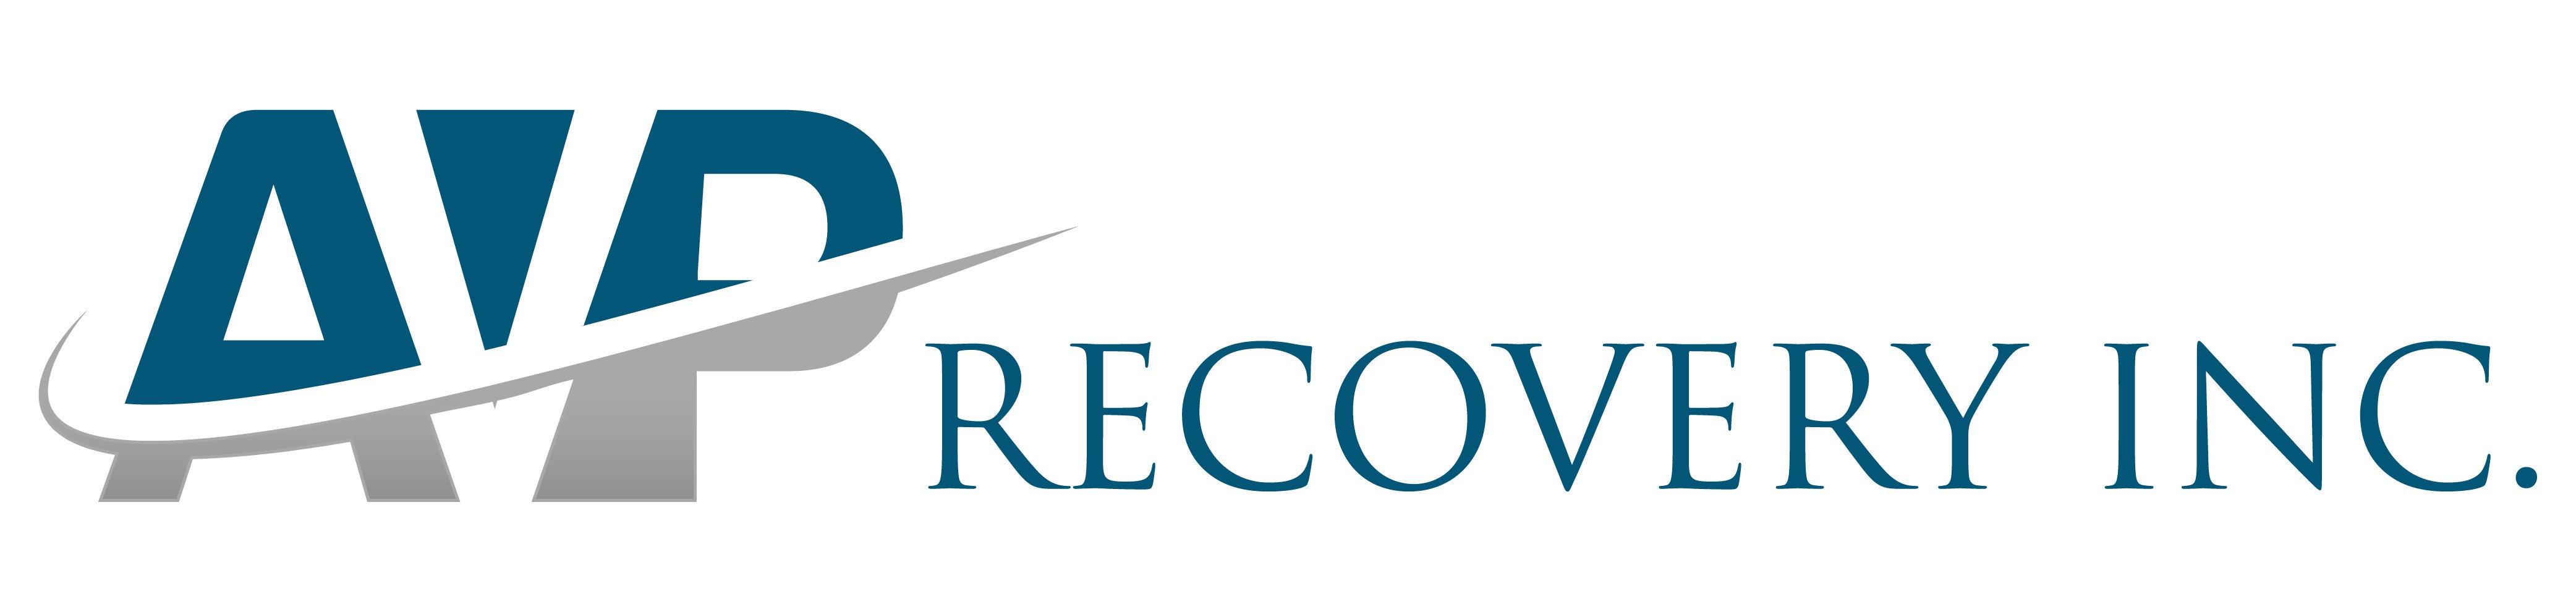 avp recovery inc